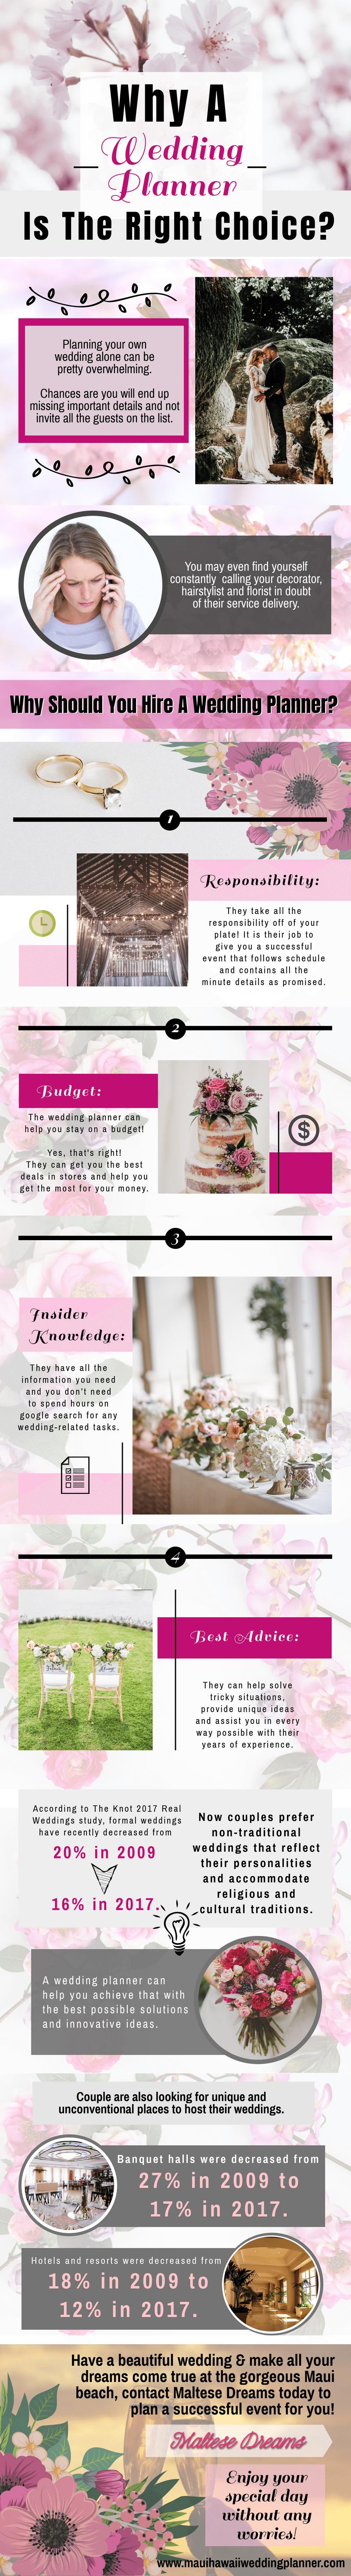 Wedding planner importance